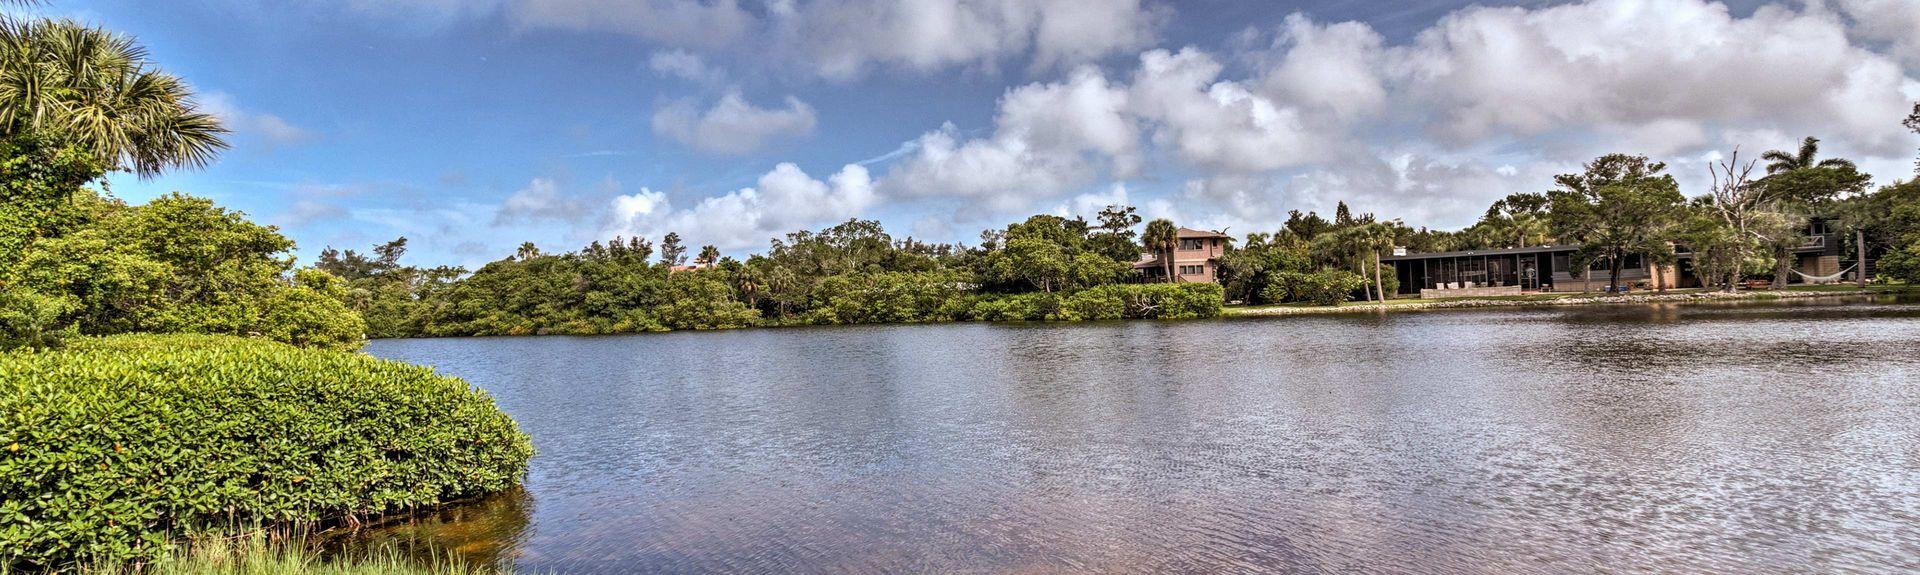 Reserva da Marina de Jim Neville, Siesta Key, Flórida, Estados Unidos